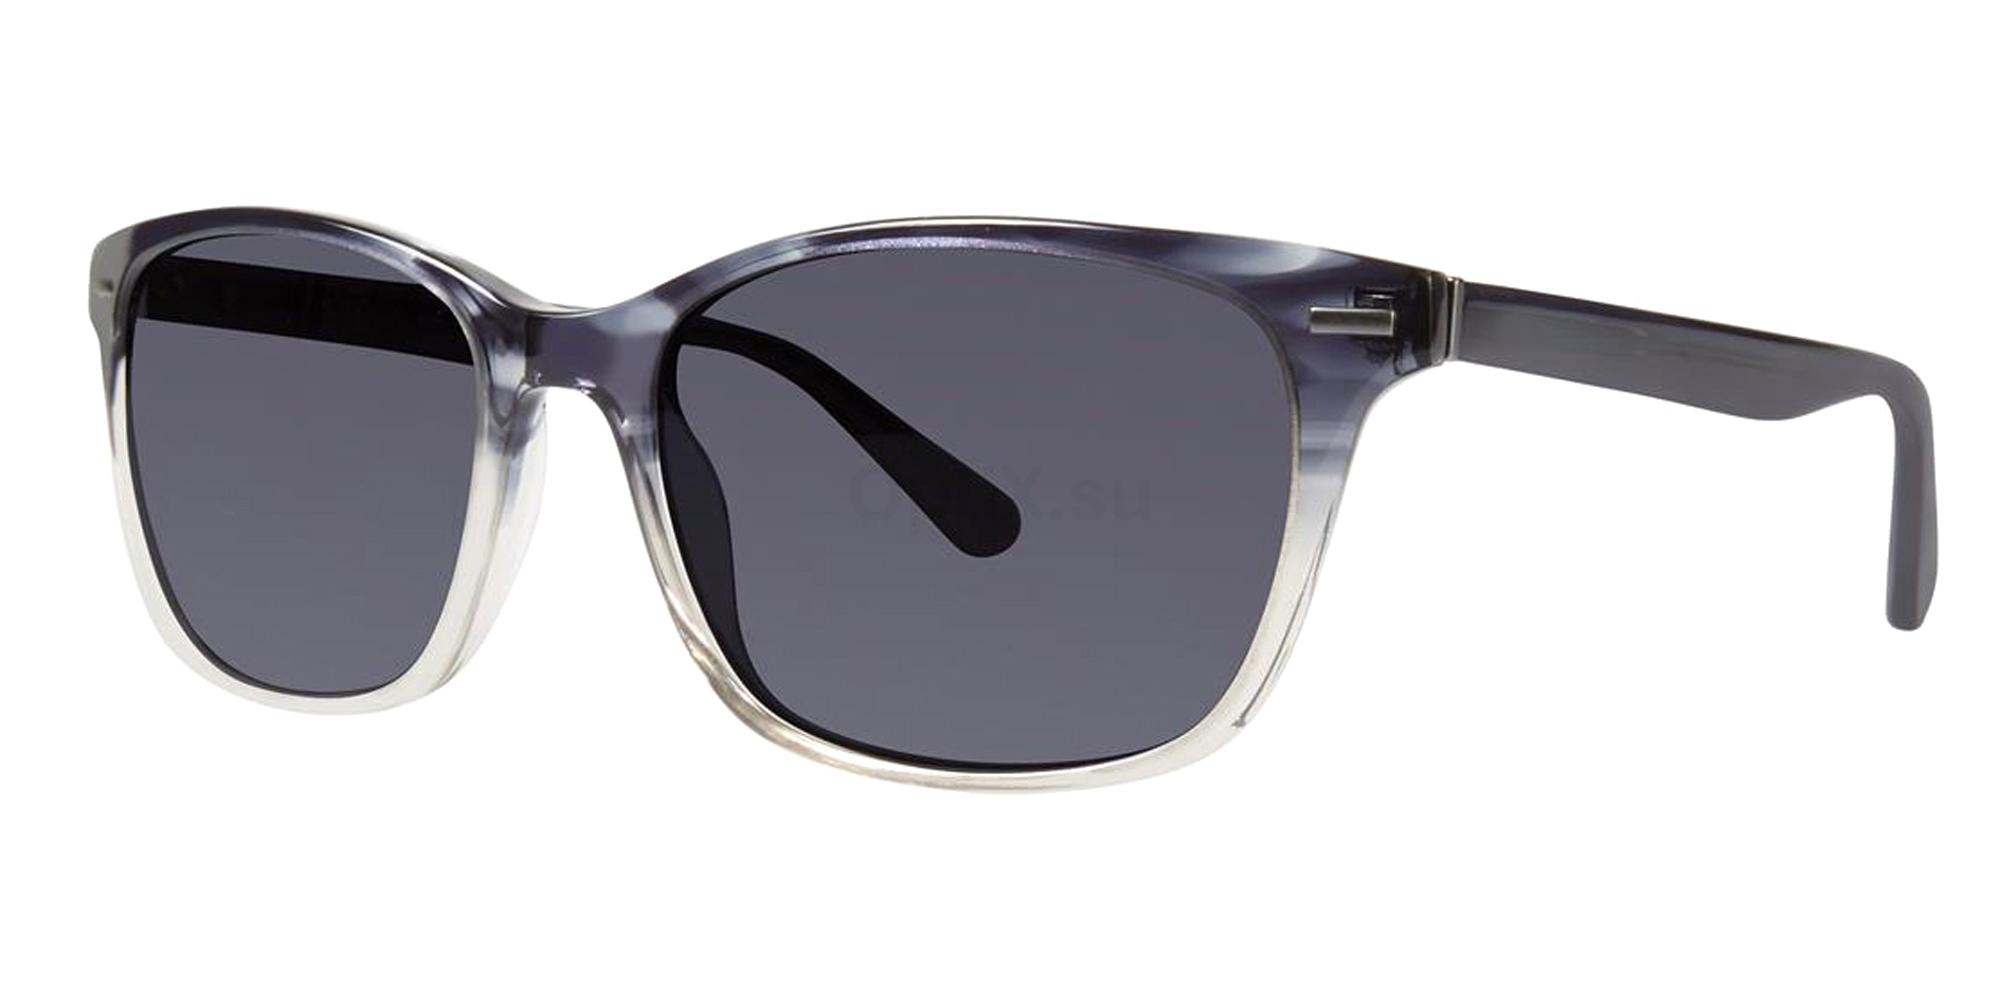 Blue Gradient SOREN Sunglasses, Zac Posen